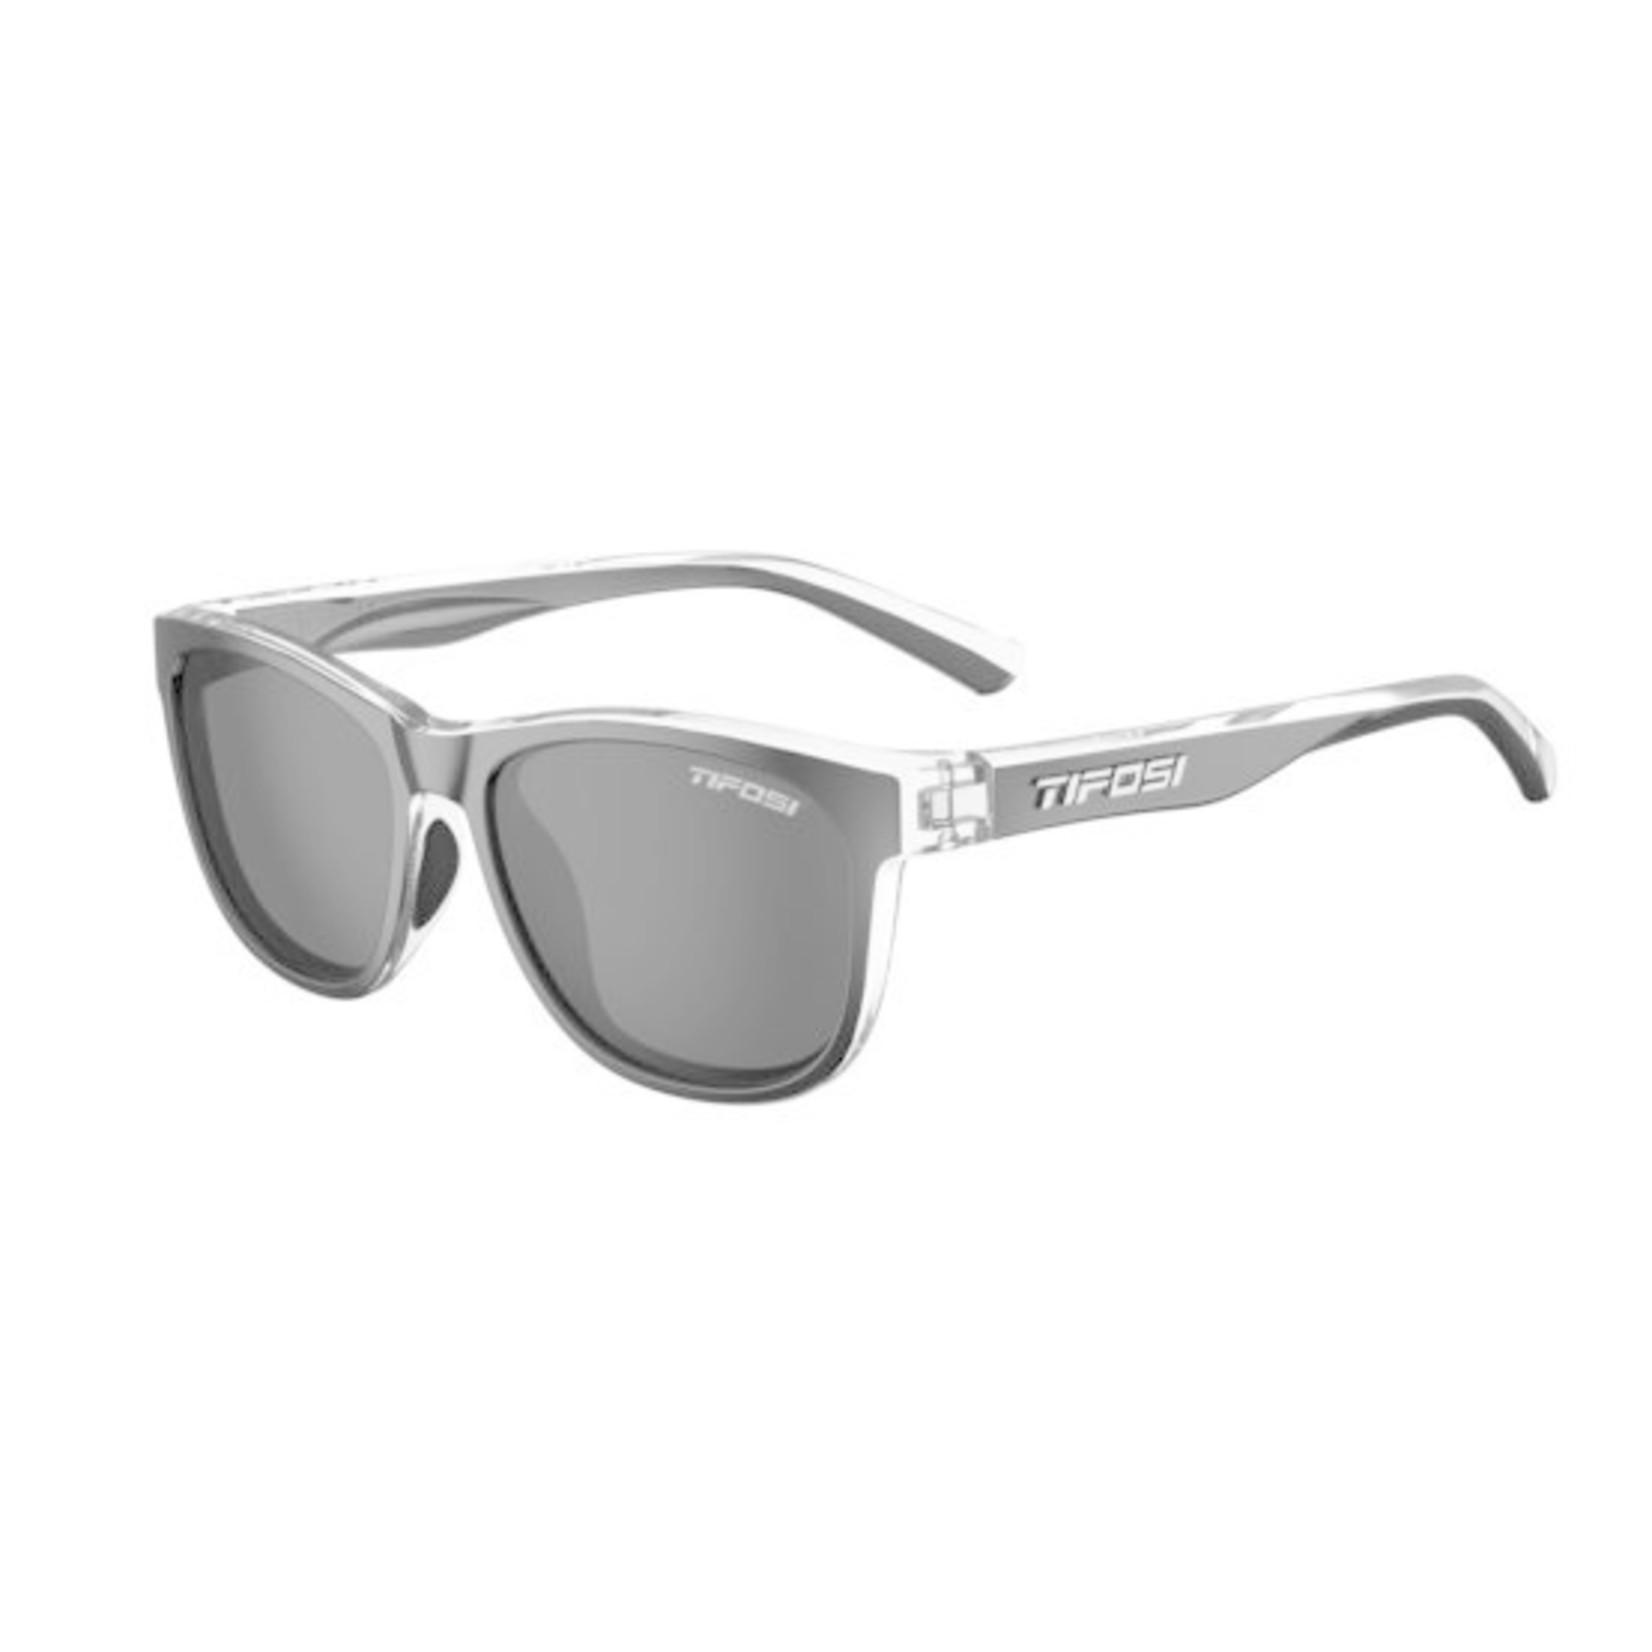 Tifosi Optics Swank, Onyx Clear Single Lens Sunglasses